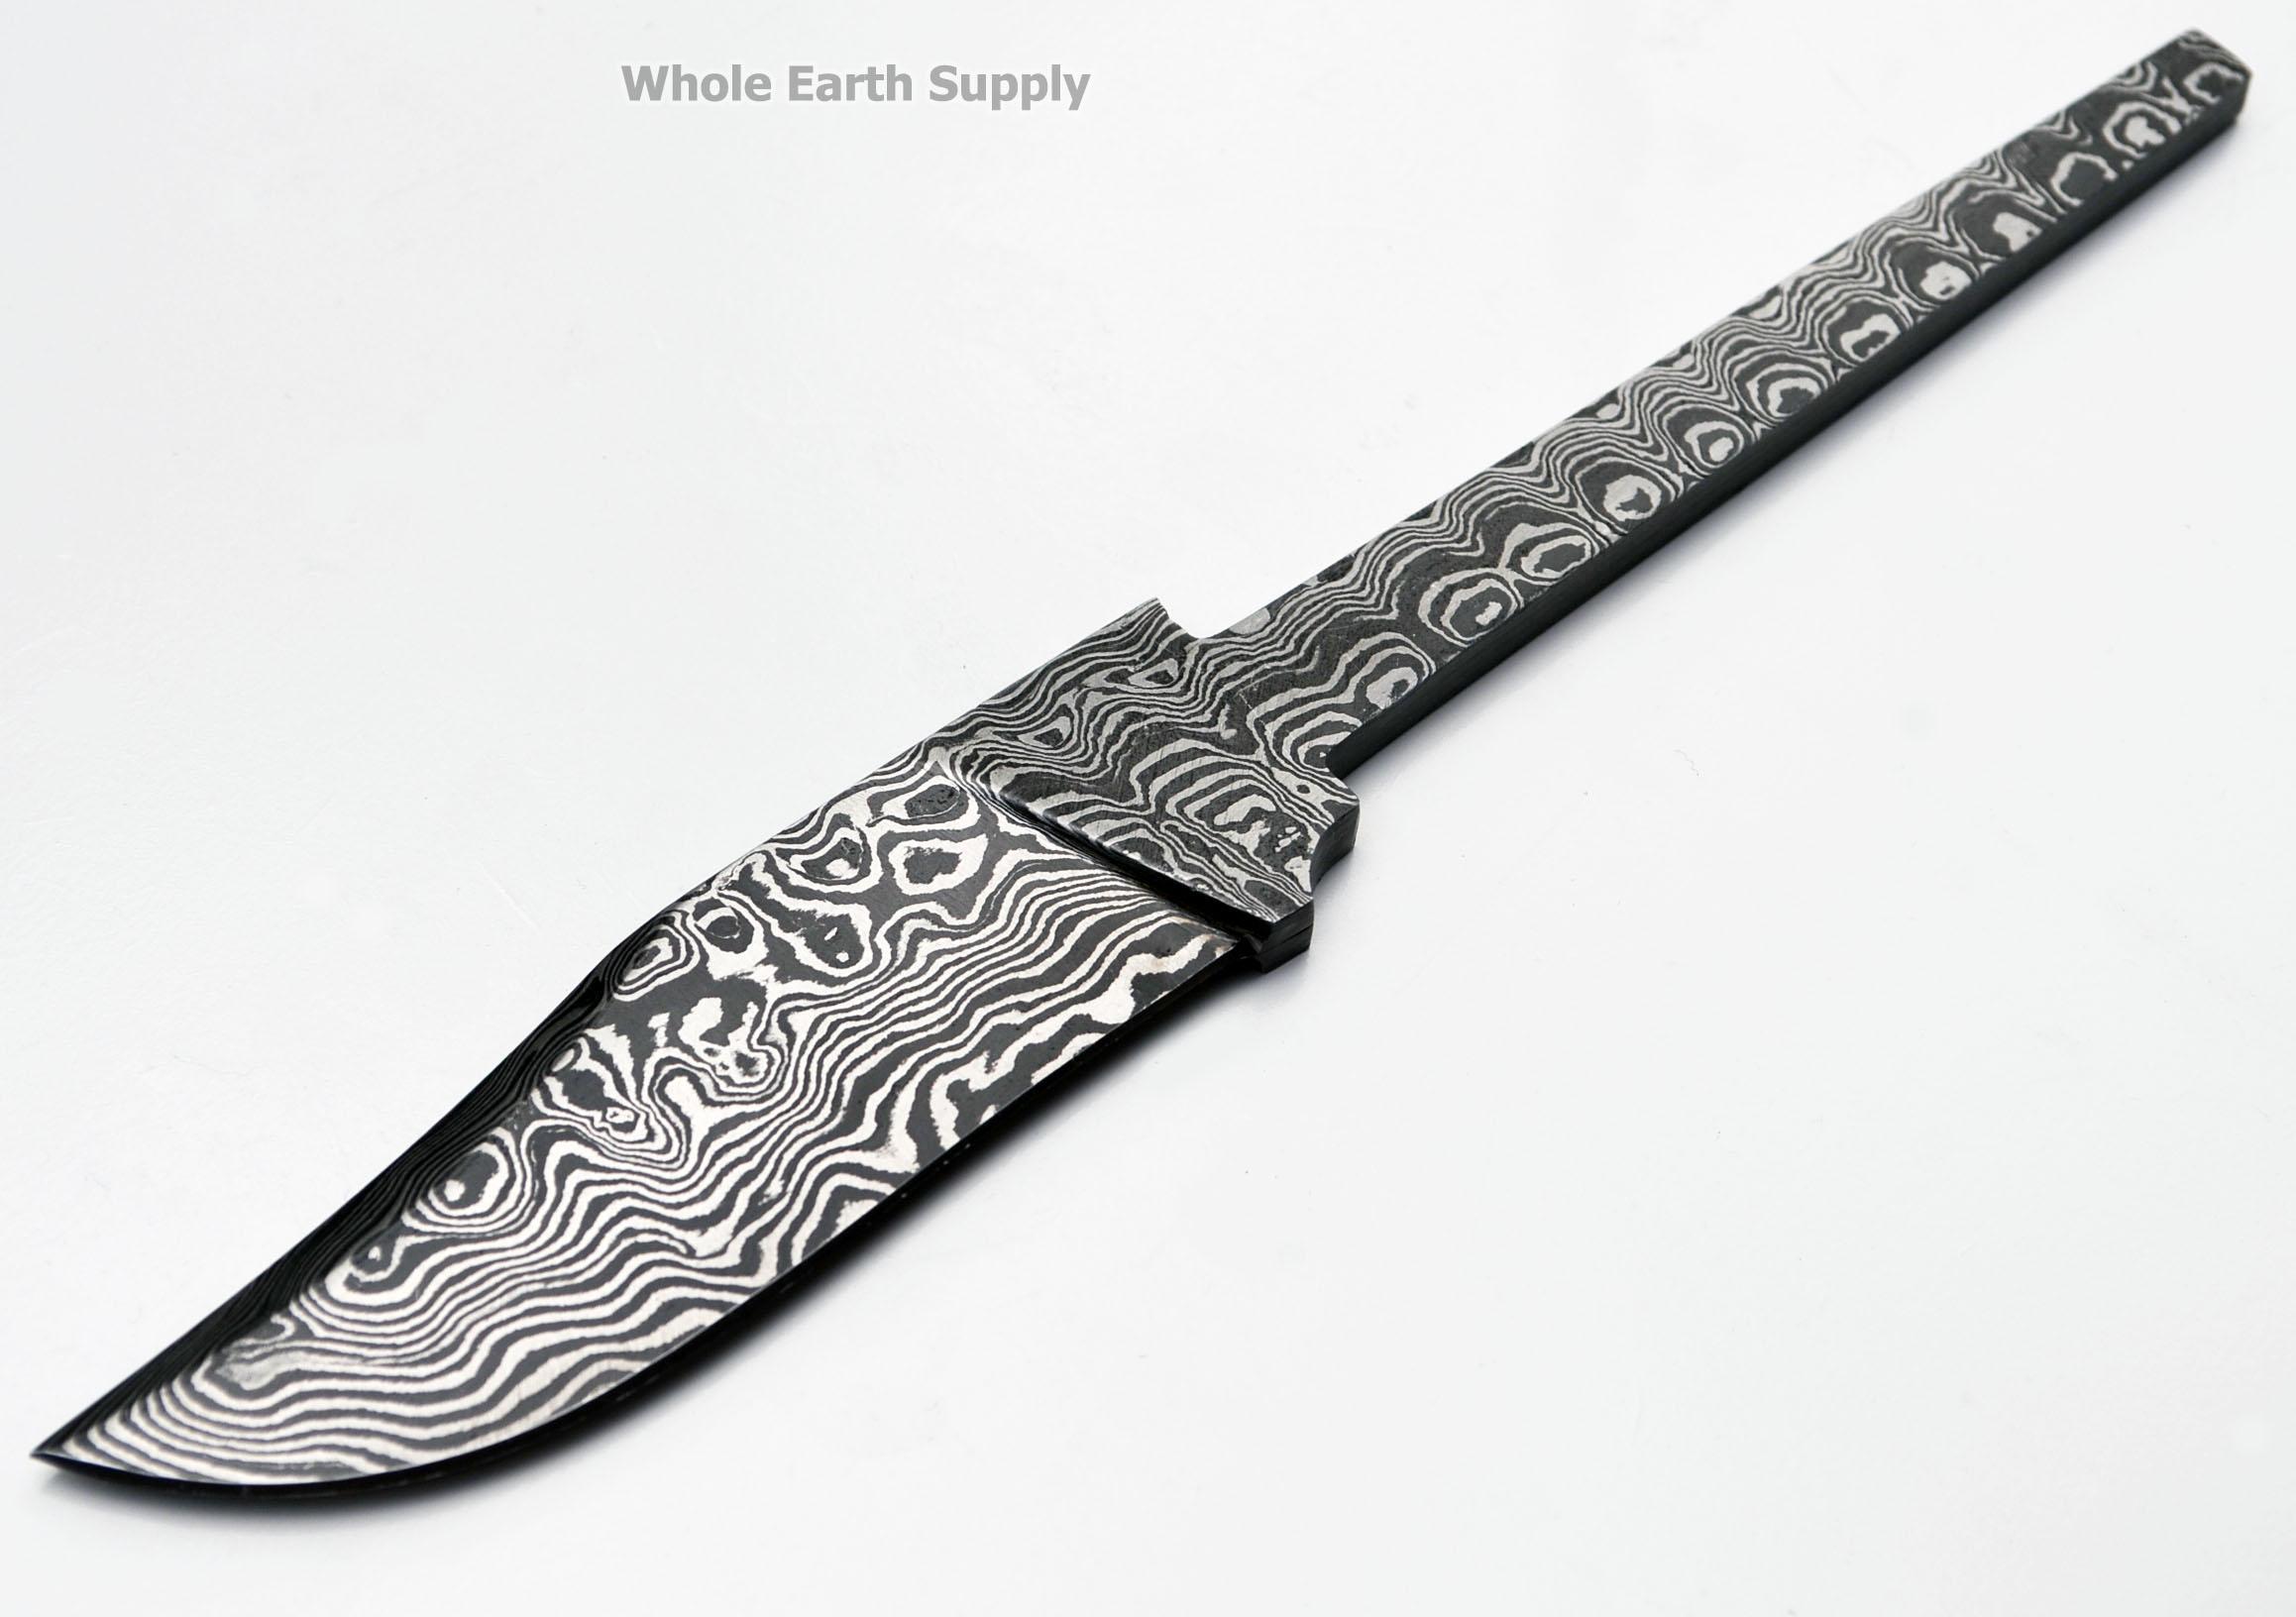 Blanks Knife Blade Making